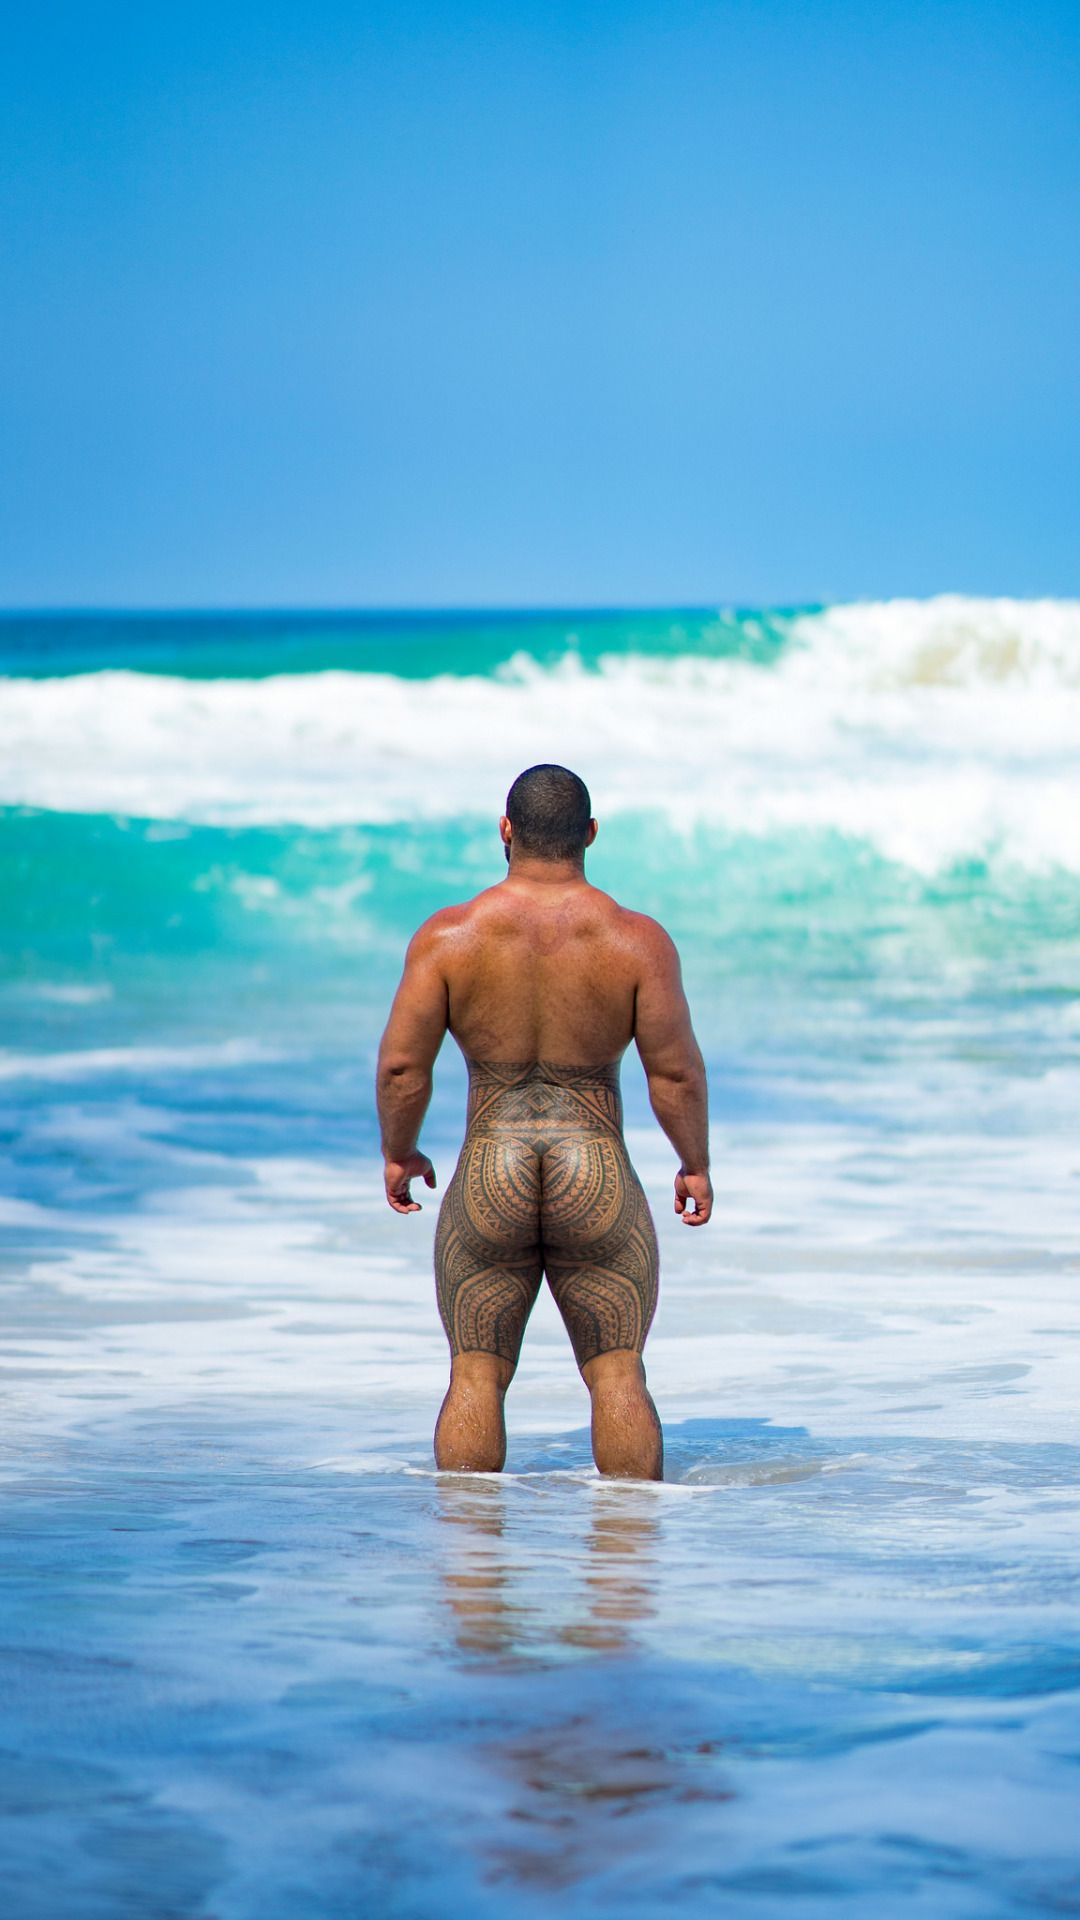 Nudist beach charleston sc images 165